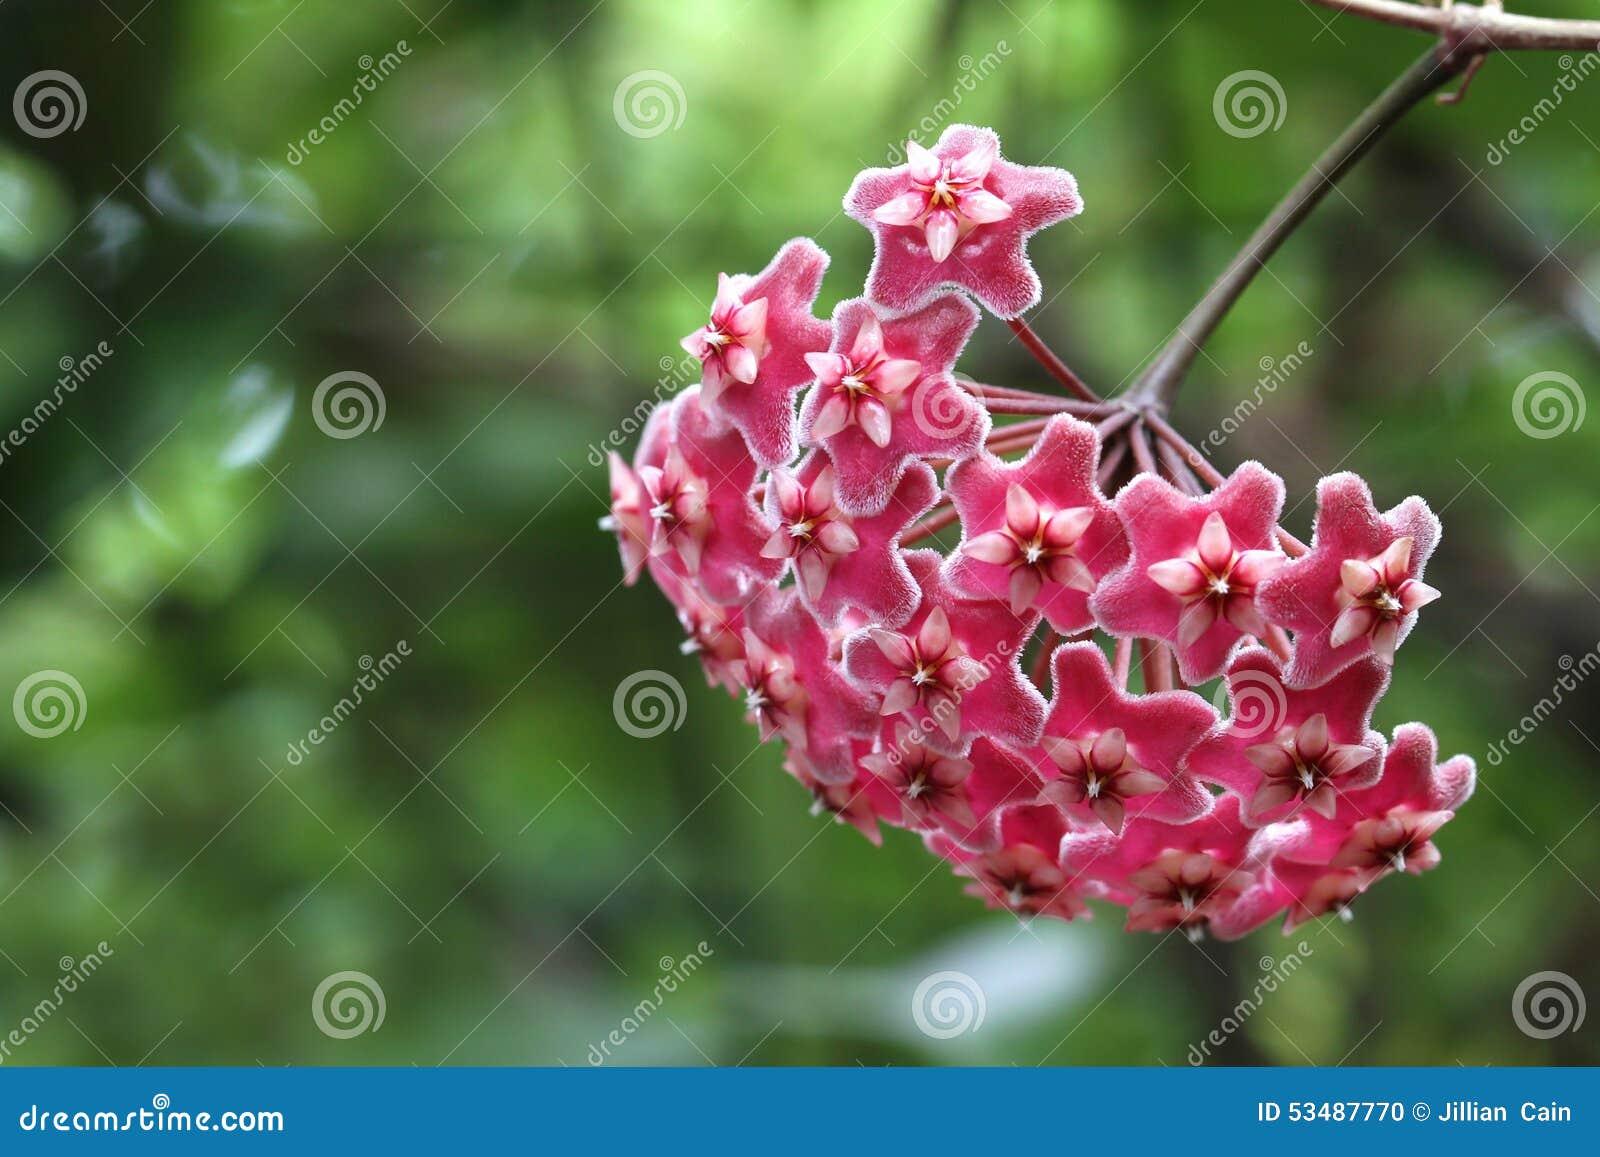 Pink Hoya flower